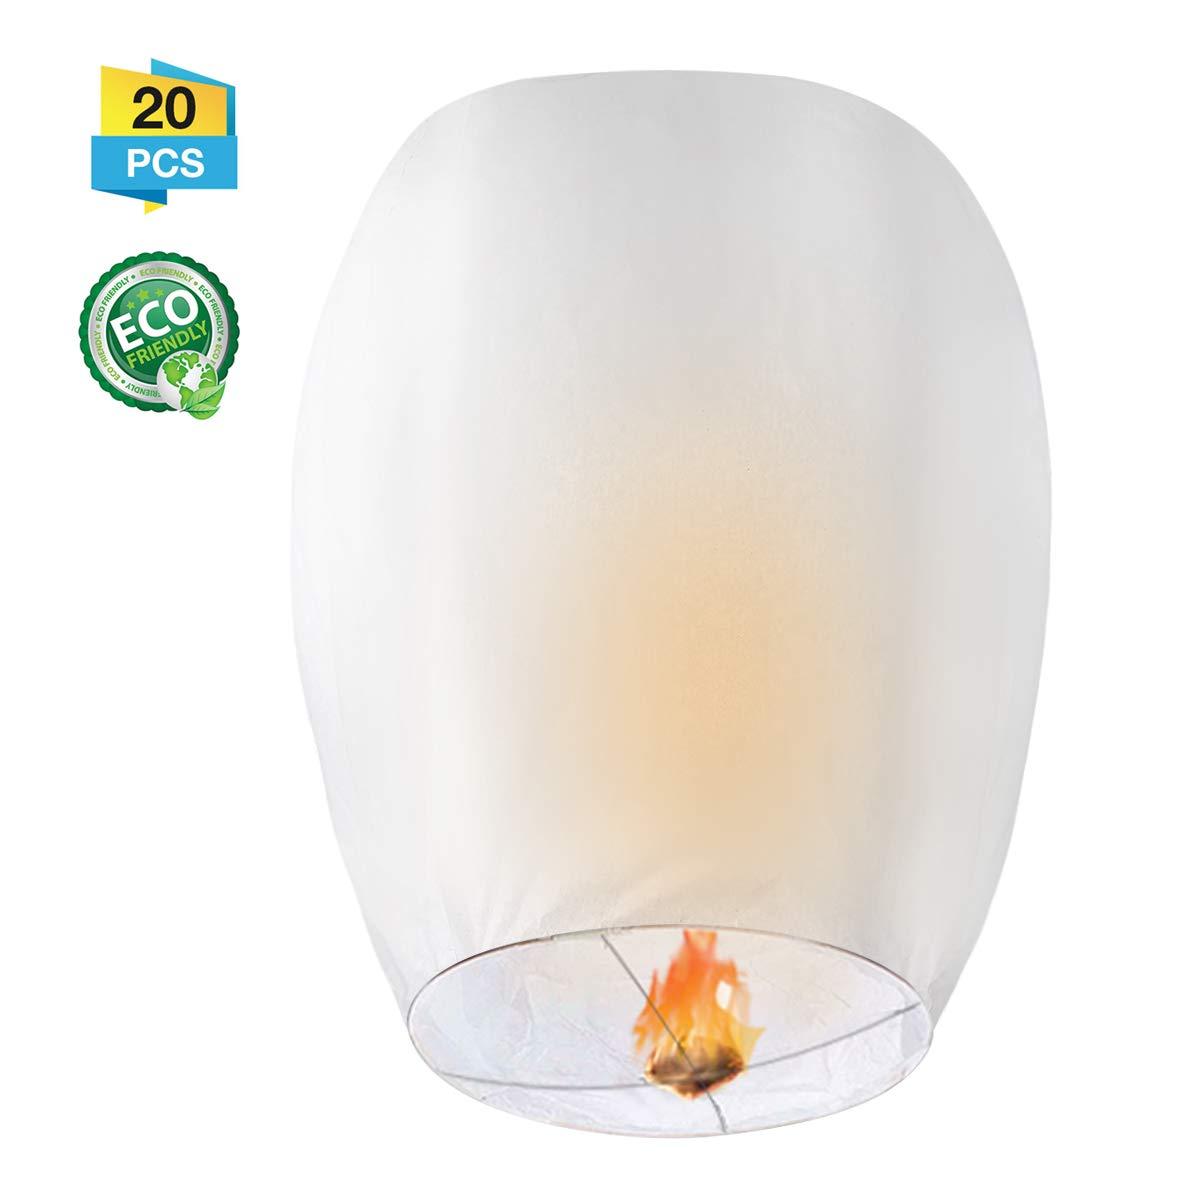 GOCHANGE Chinese Lanterns, 20 Pack Sky Lanterns - 100% Biodegradable, Eco-Friendly, Paper Lanterns for Weddings, Celebrations, Memorial Ceremonies, White Flying Sky Lanterns